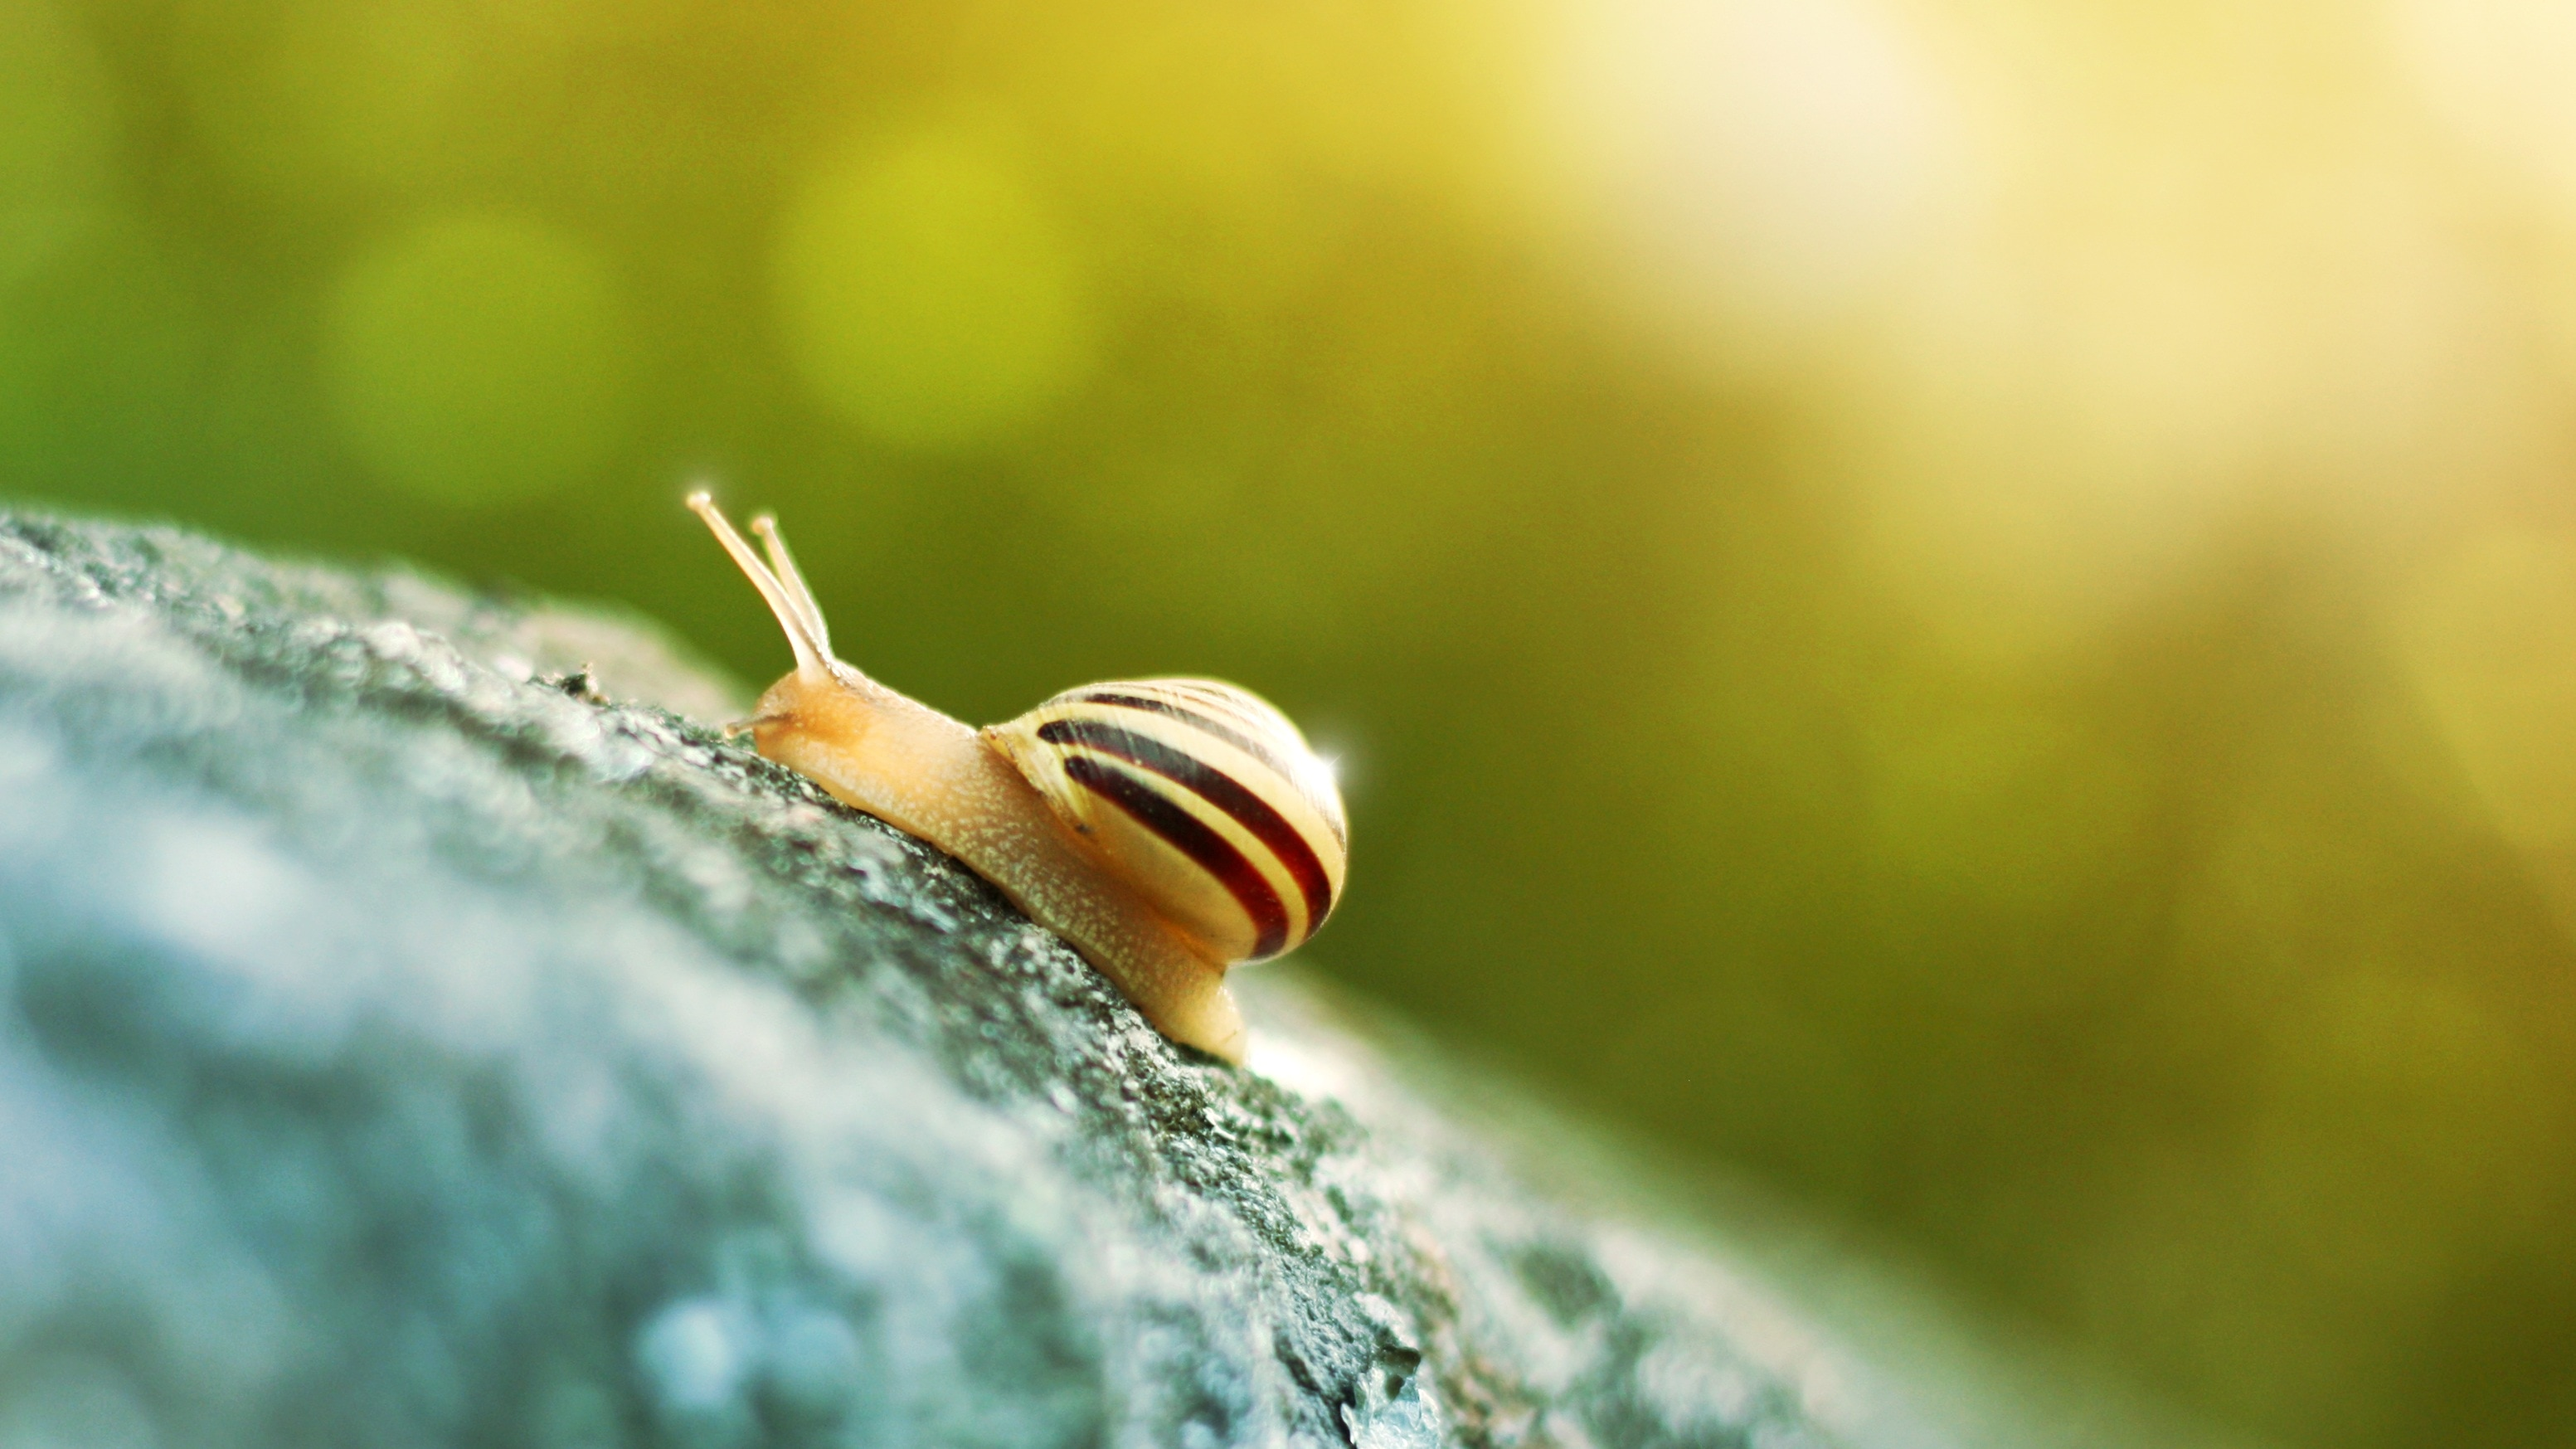 Free Summer Wallpaper Cute Beige And Black Snail Free Image Peakpx